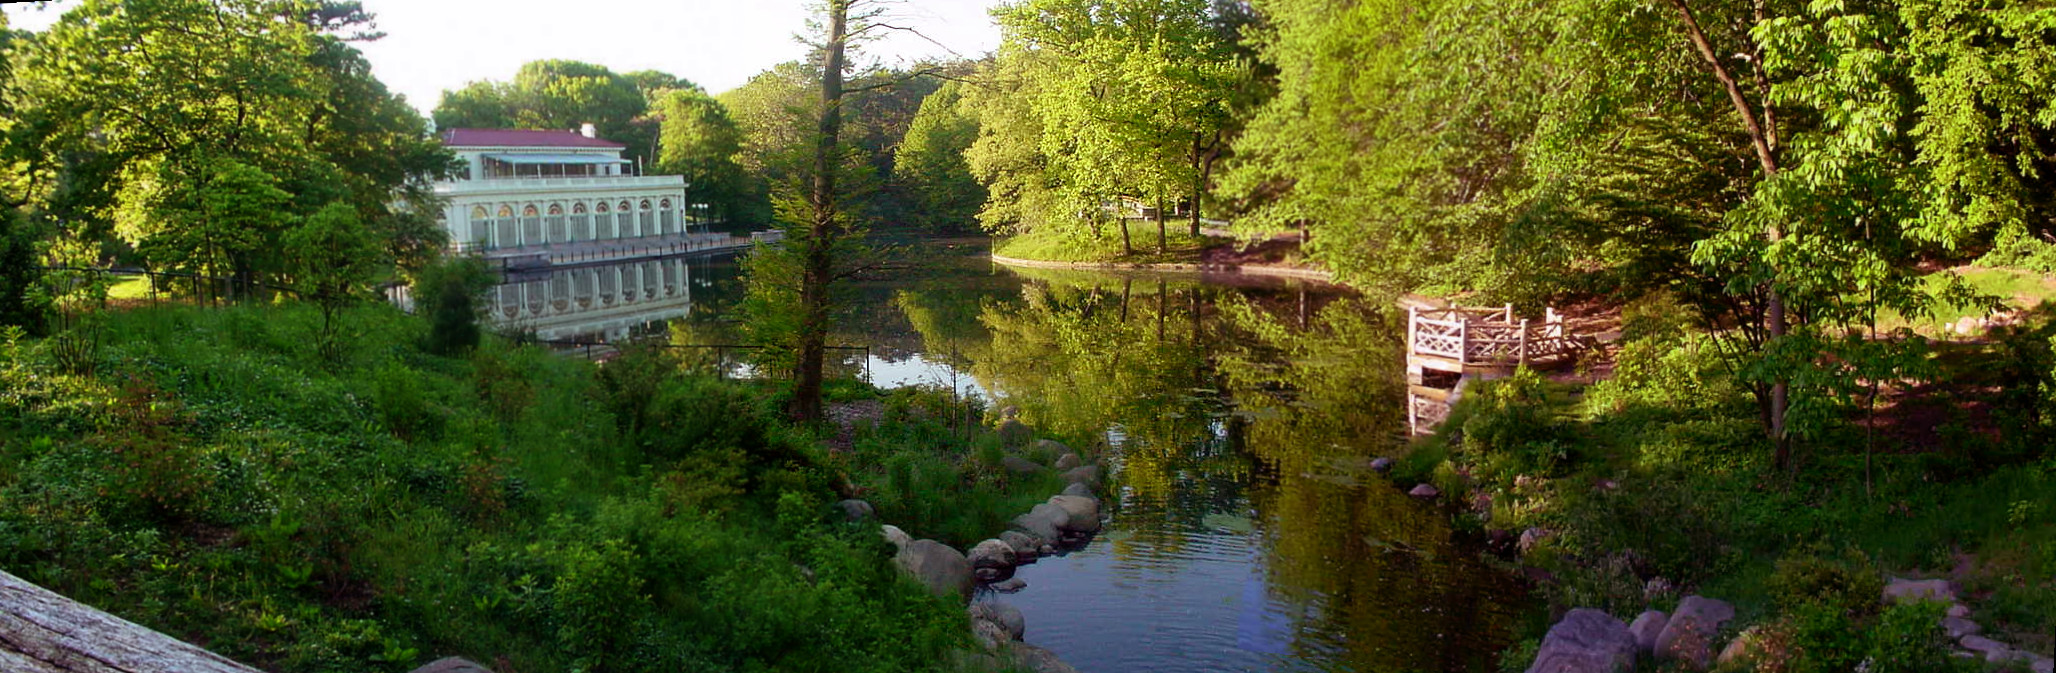 Audubon Center, Prospect Park. Photography Credit:Garry R. Osgood